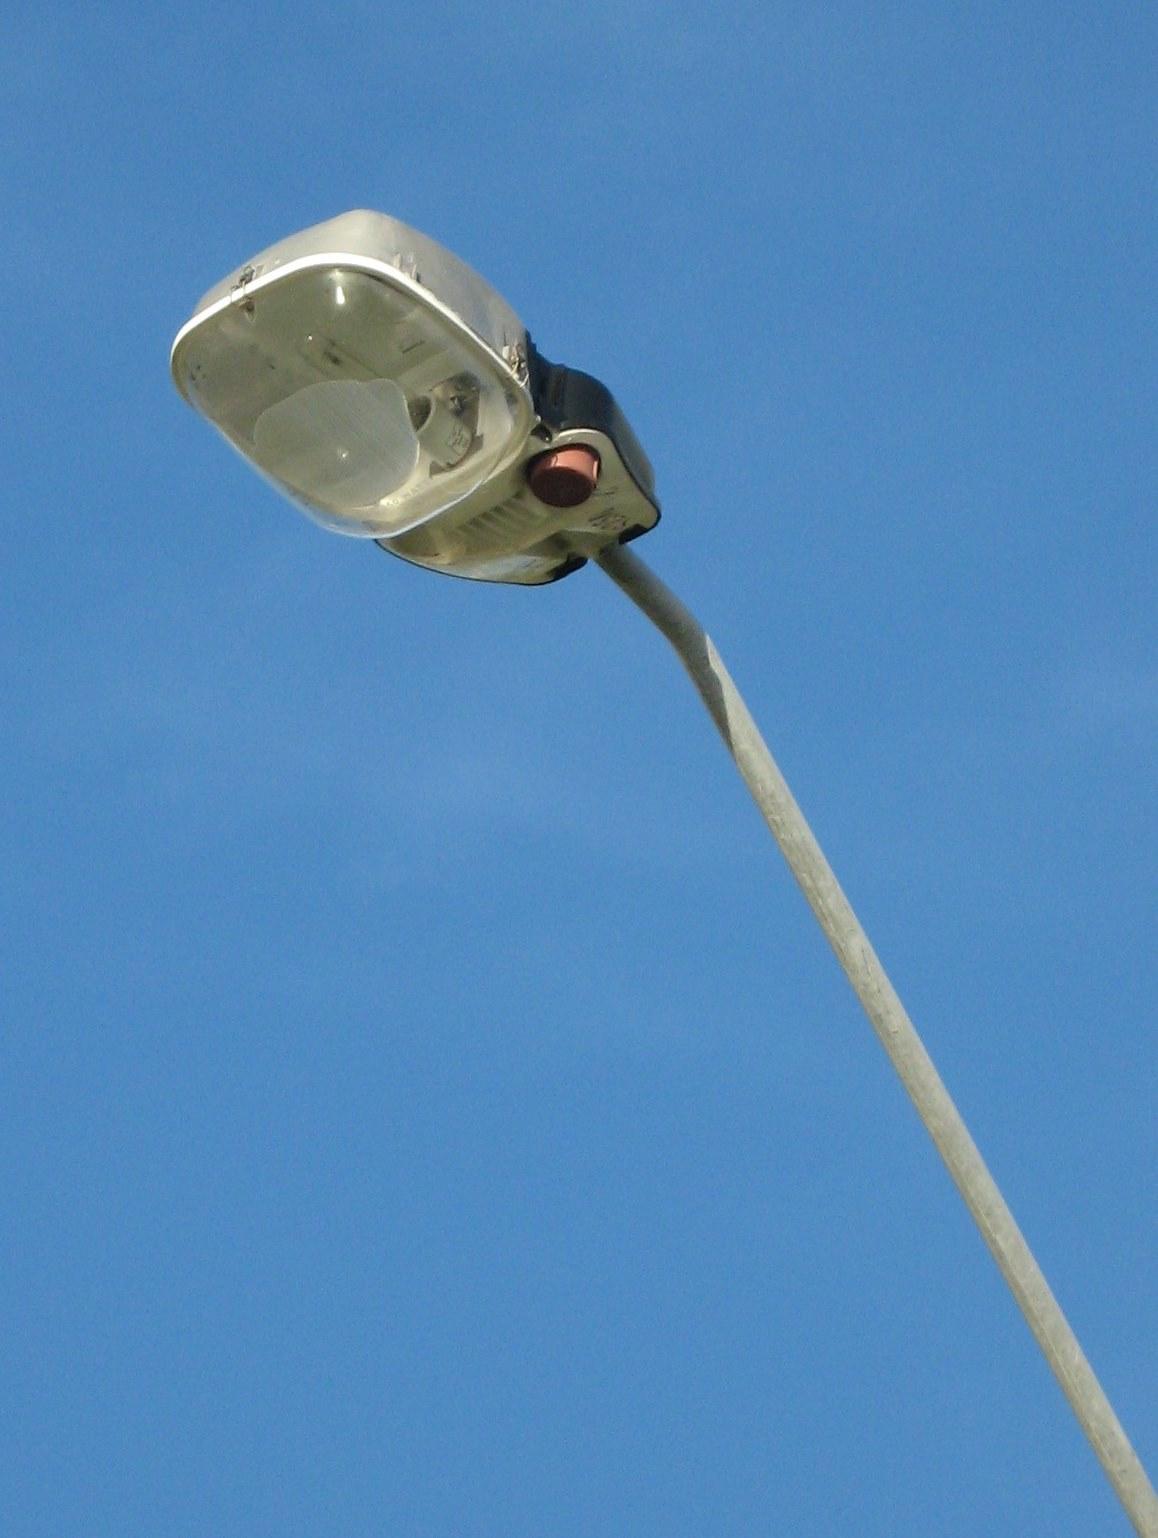 File:Streetlight Lantern.JPG - Wikimedia Commons